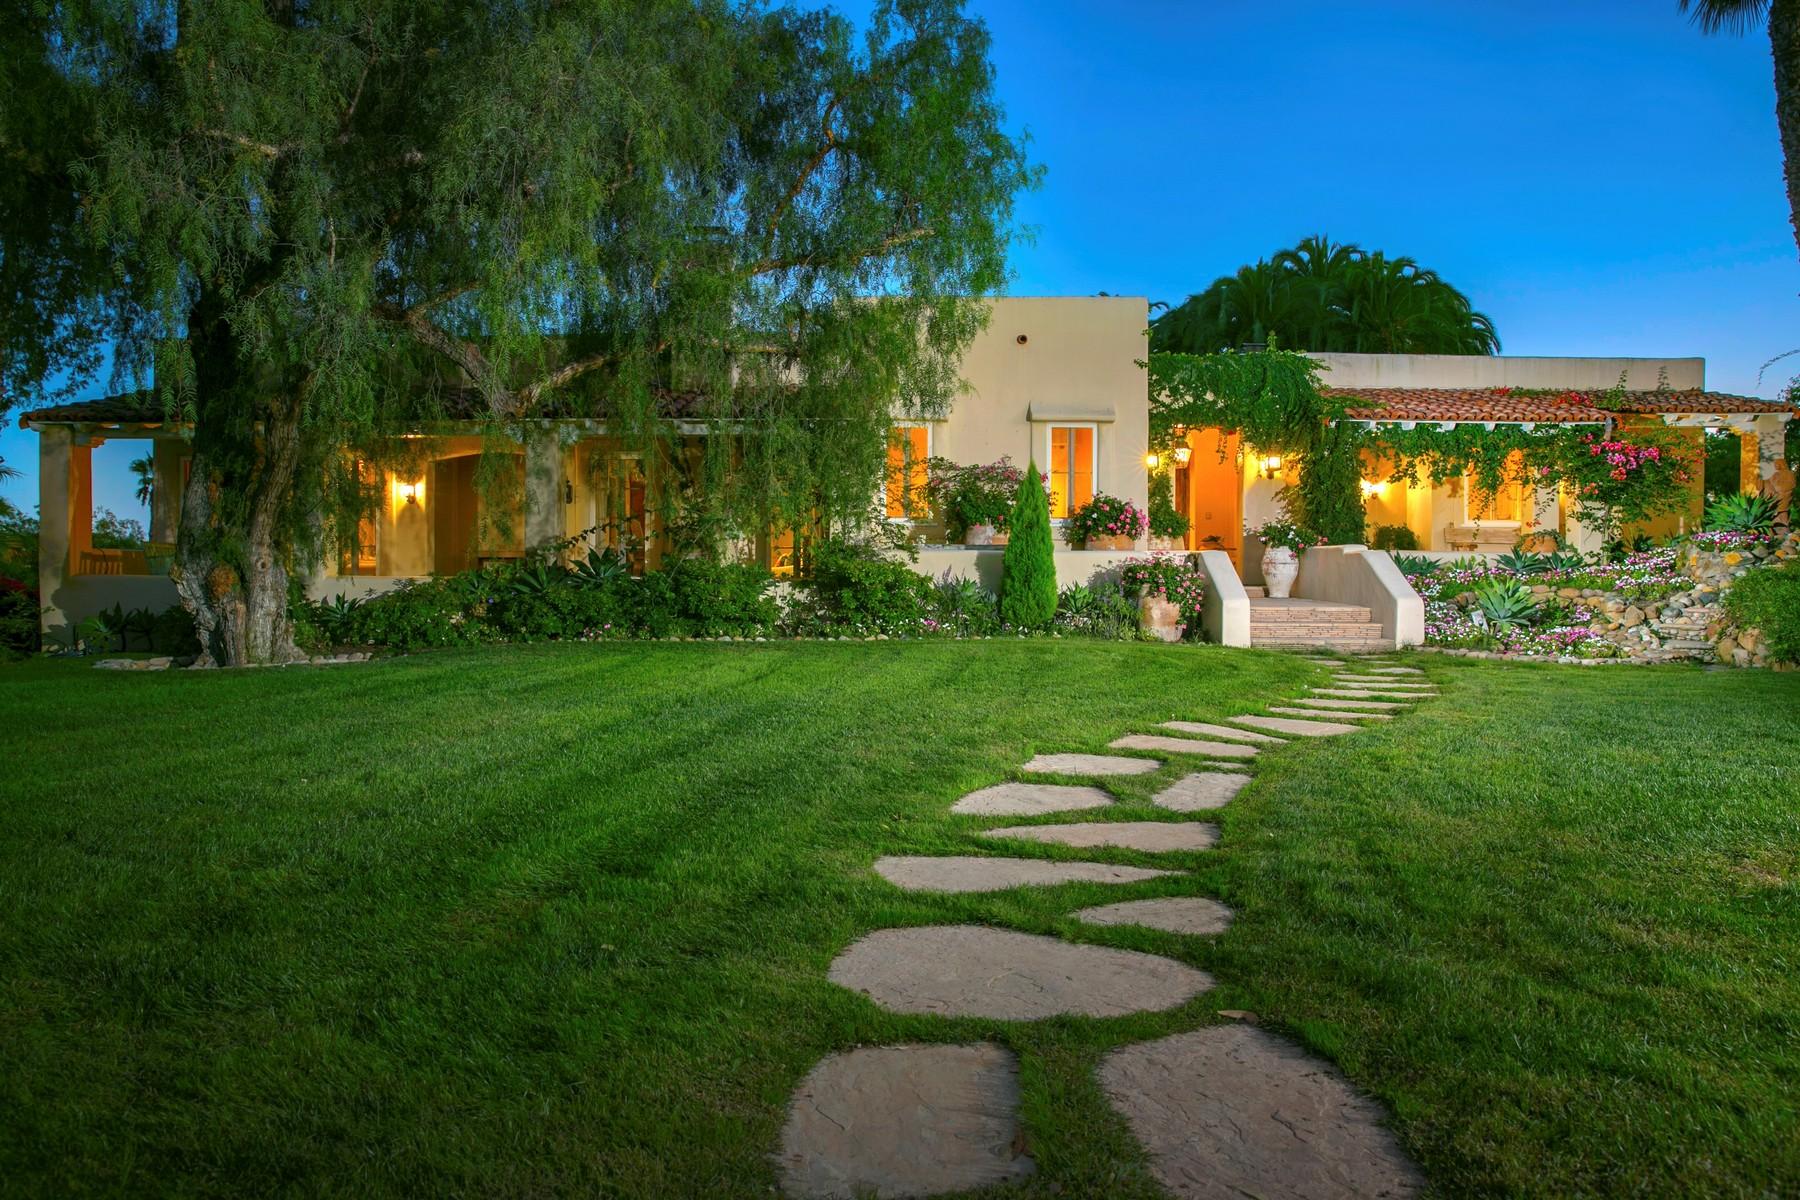 Single Family Home for Sale at 6855 La Valle Plateada Rancho Santa Fe, California 92067 United States